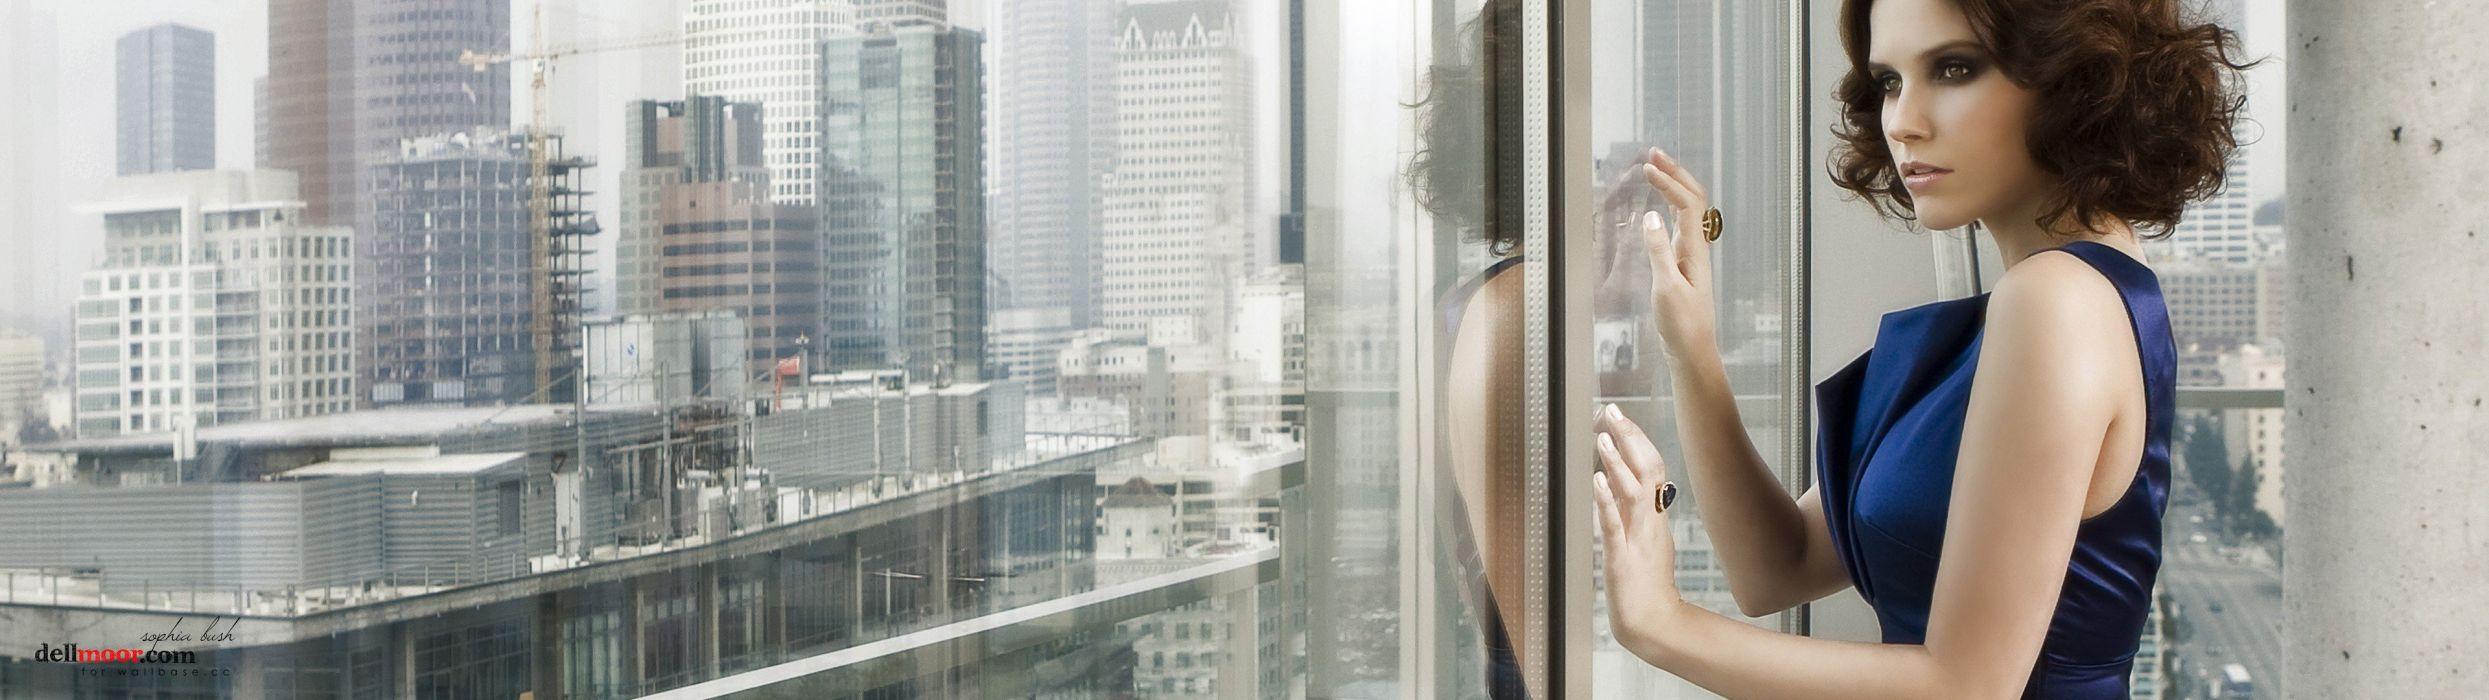 models Sophia Bush multiscreen wallpaper